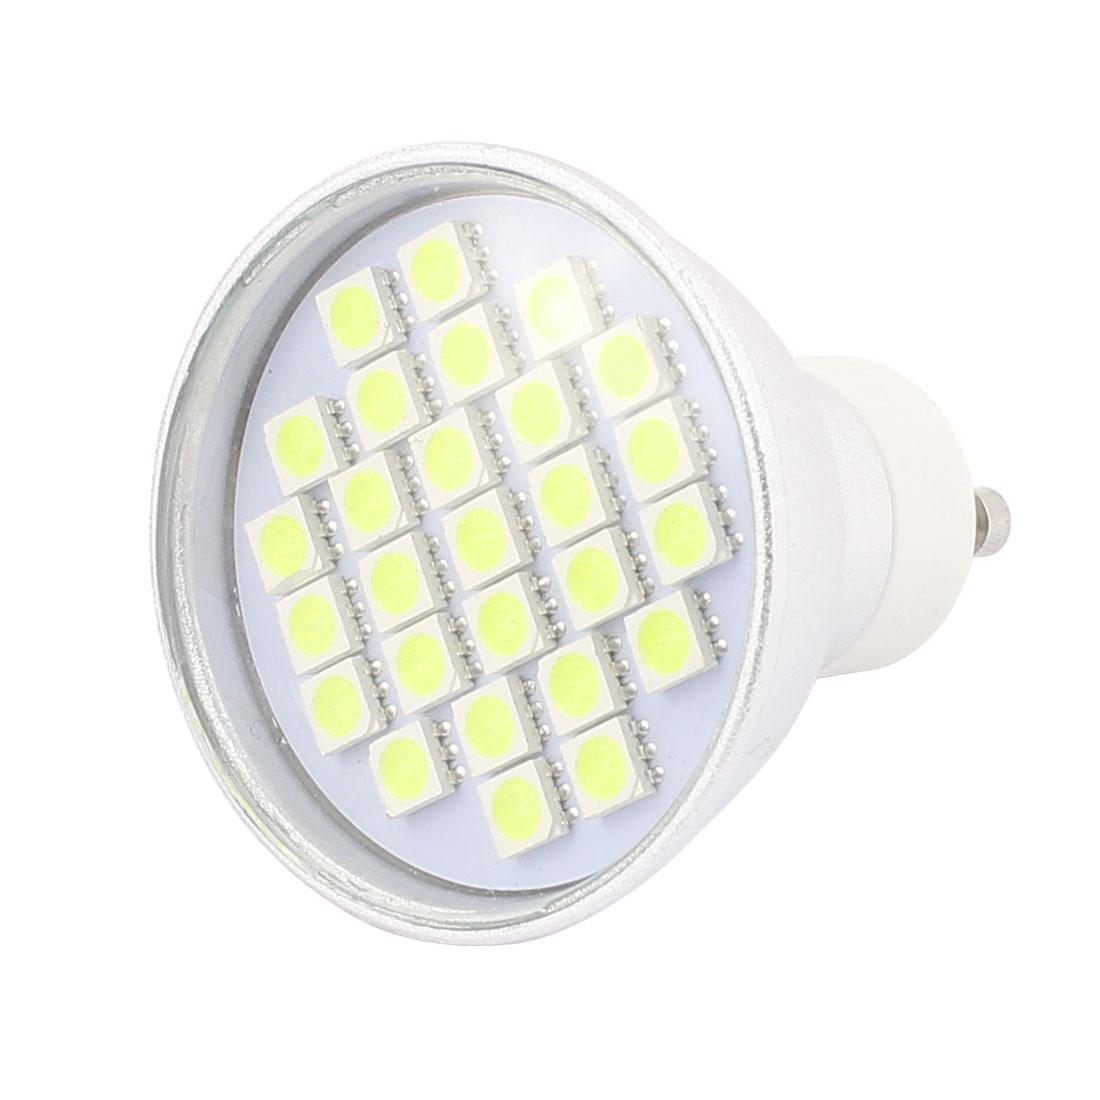 110V GU10 LED Light 4W 5050 SMD 27 LEDs Spotlight Down Lamp Bulb Energy Saving Pure White